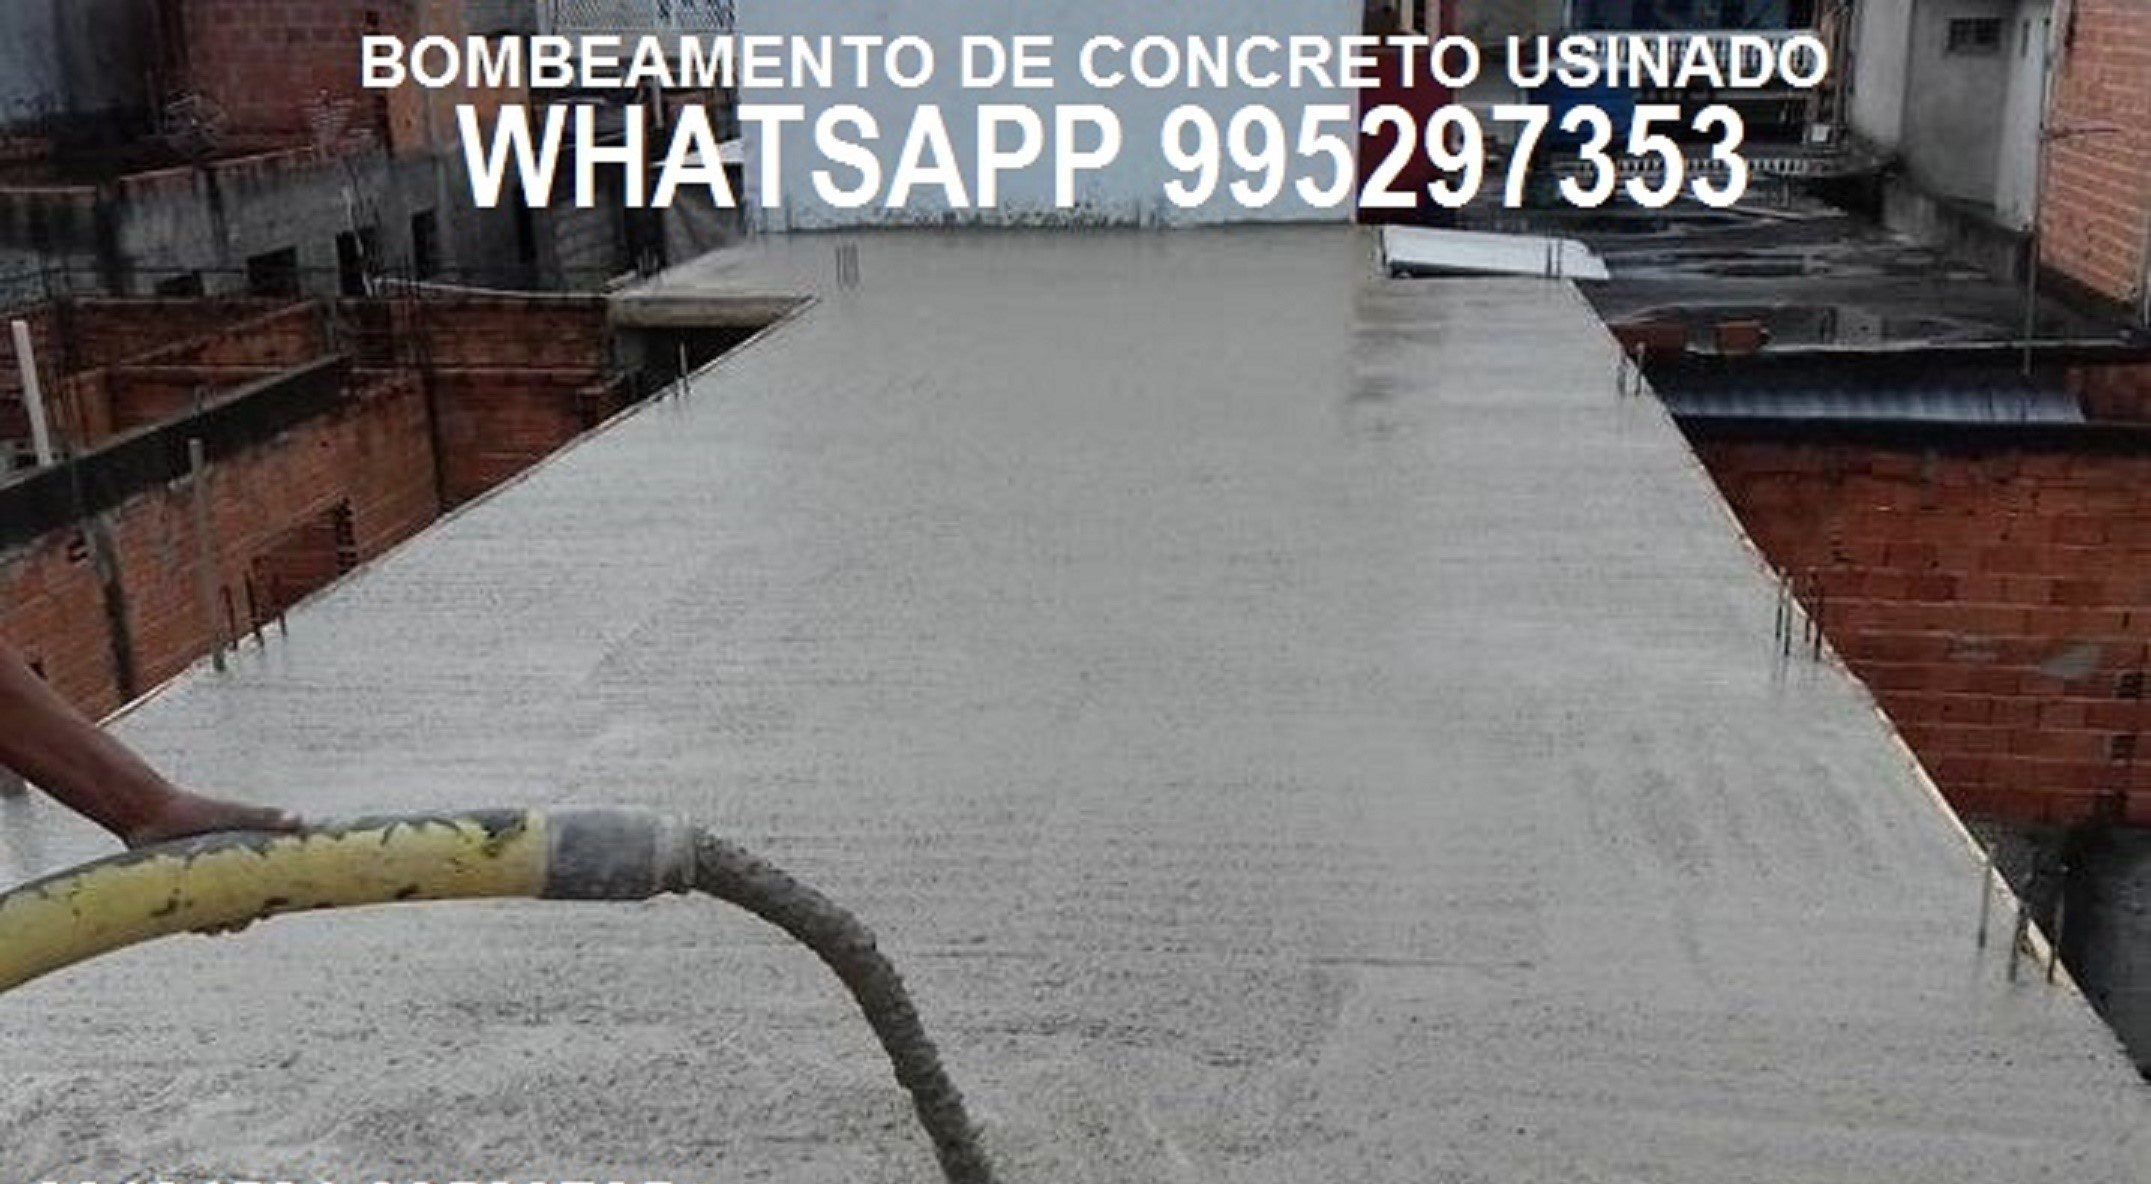 Concreto Bombeado entregas em toda Zona Oeste do Rio